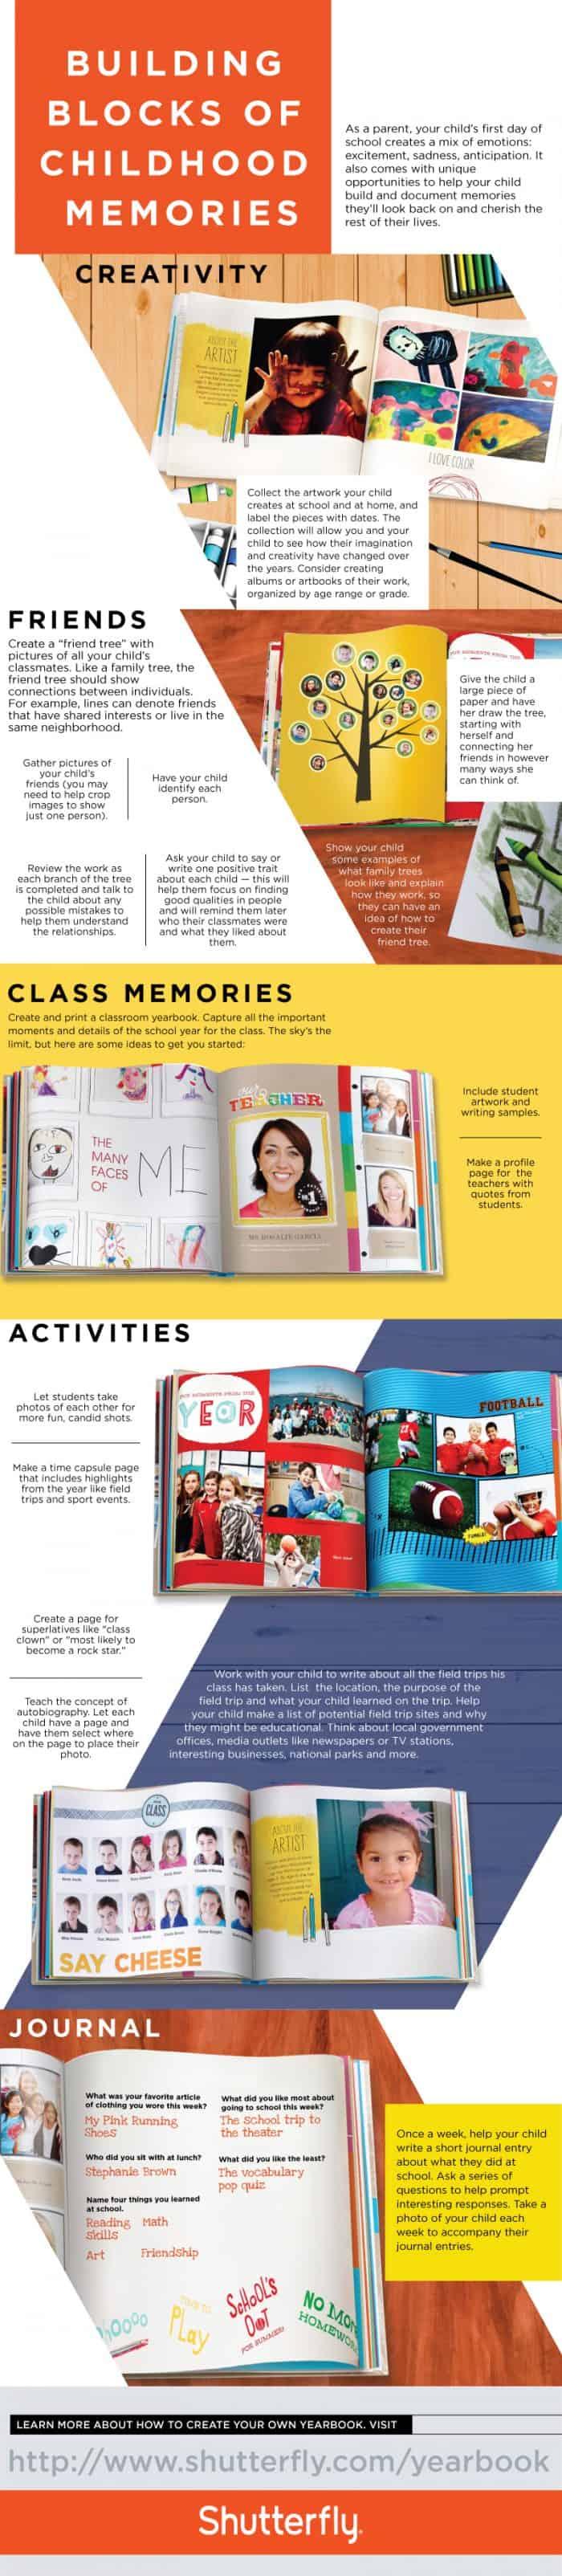 Building Blocks of Childhood Memories Infographic